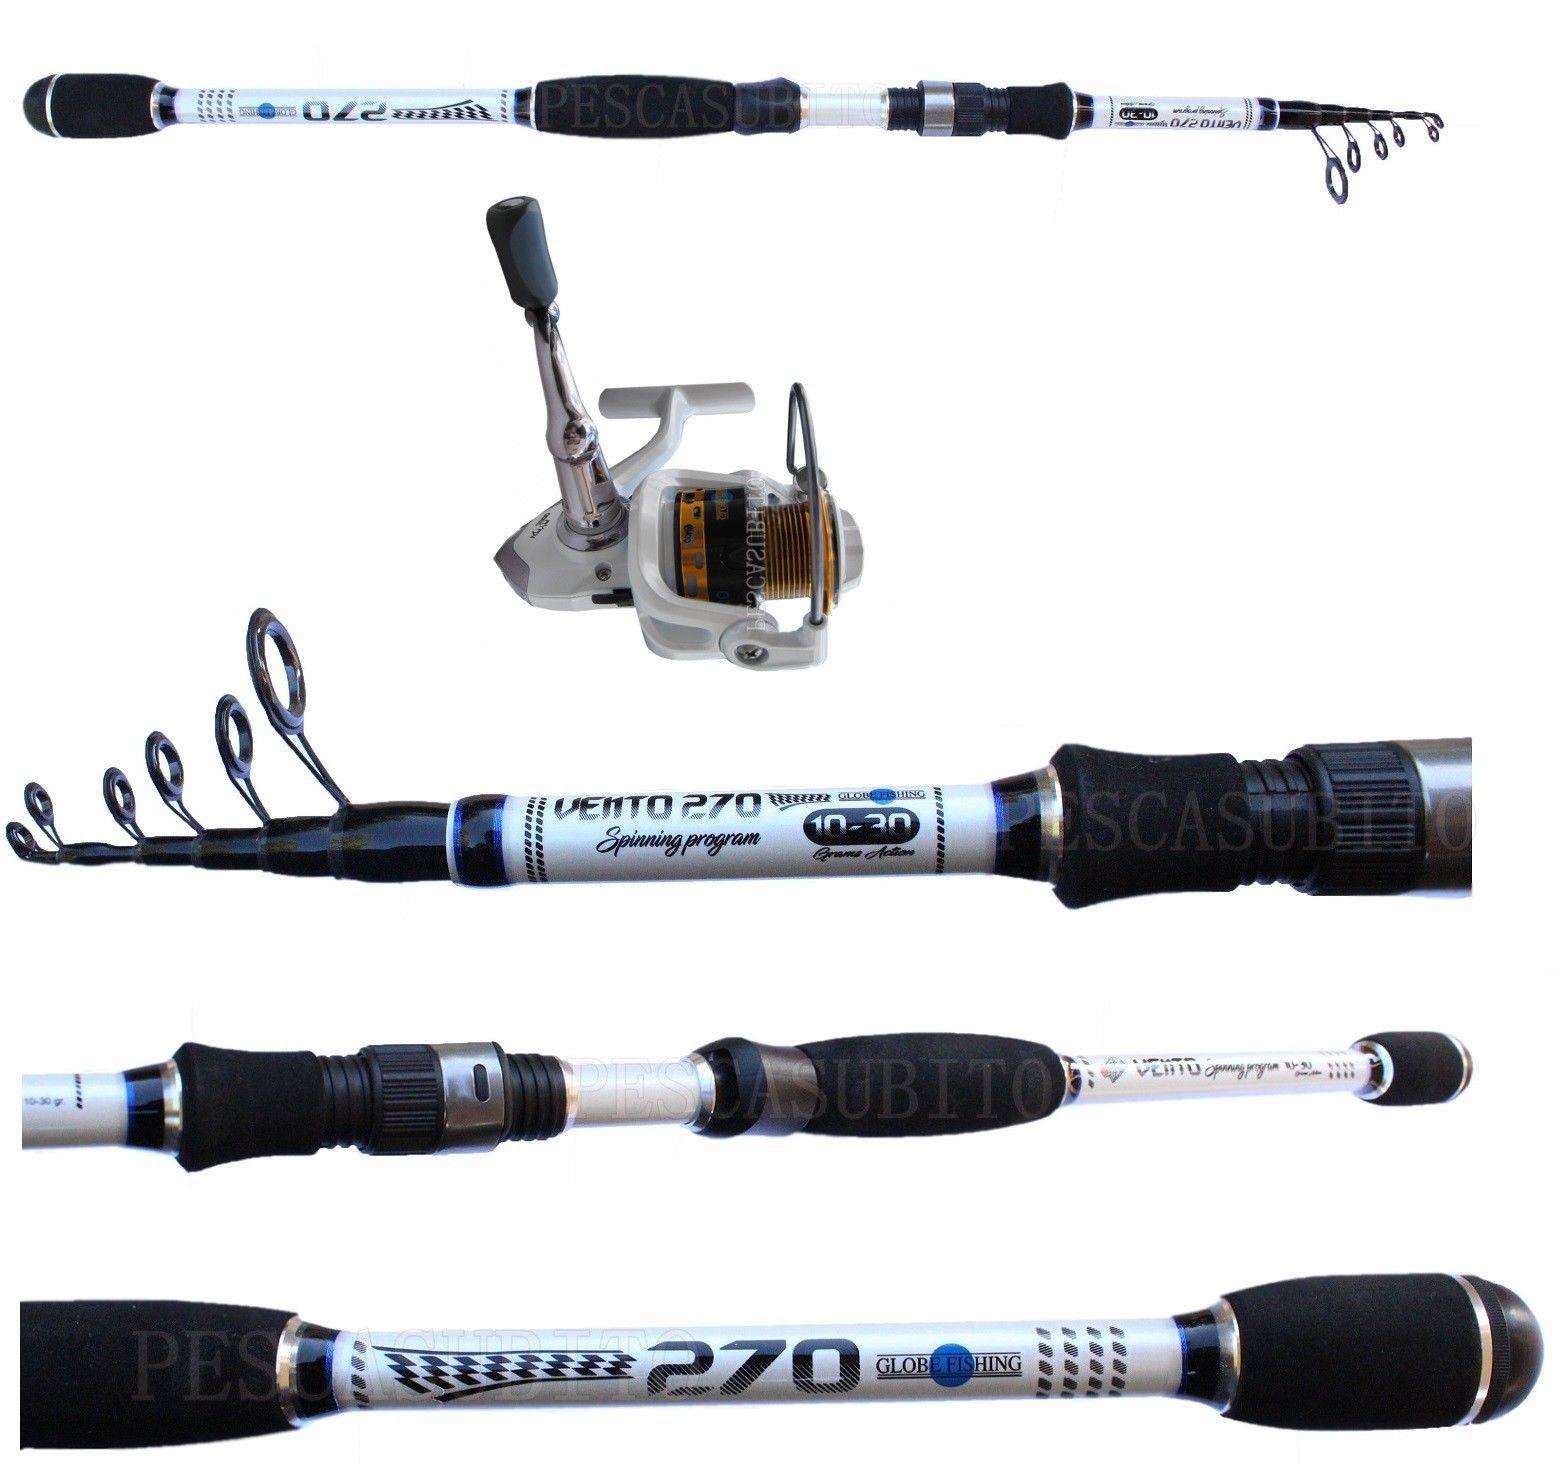 Combo Canna Pesca Spinning Vento 2.70m 2.70m 2.70m 10 30g + Mulinello Kaya Trota Bass Travel a1e1a1